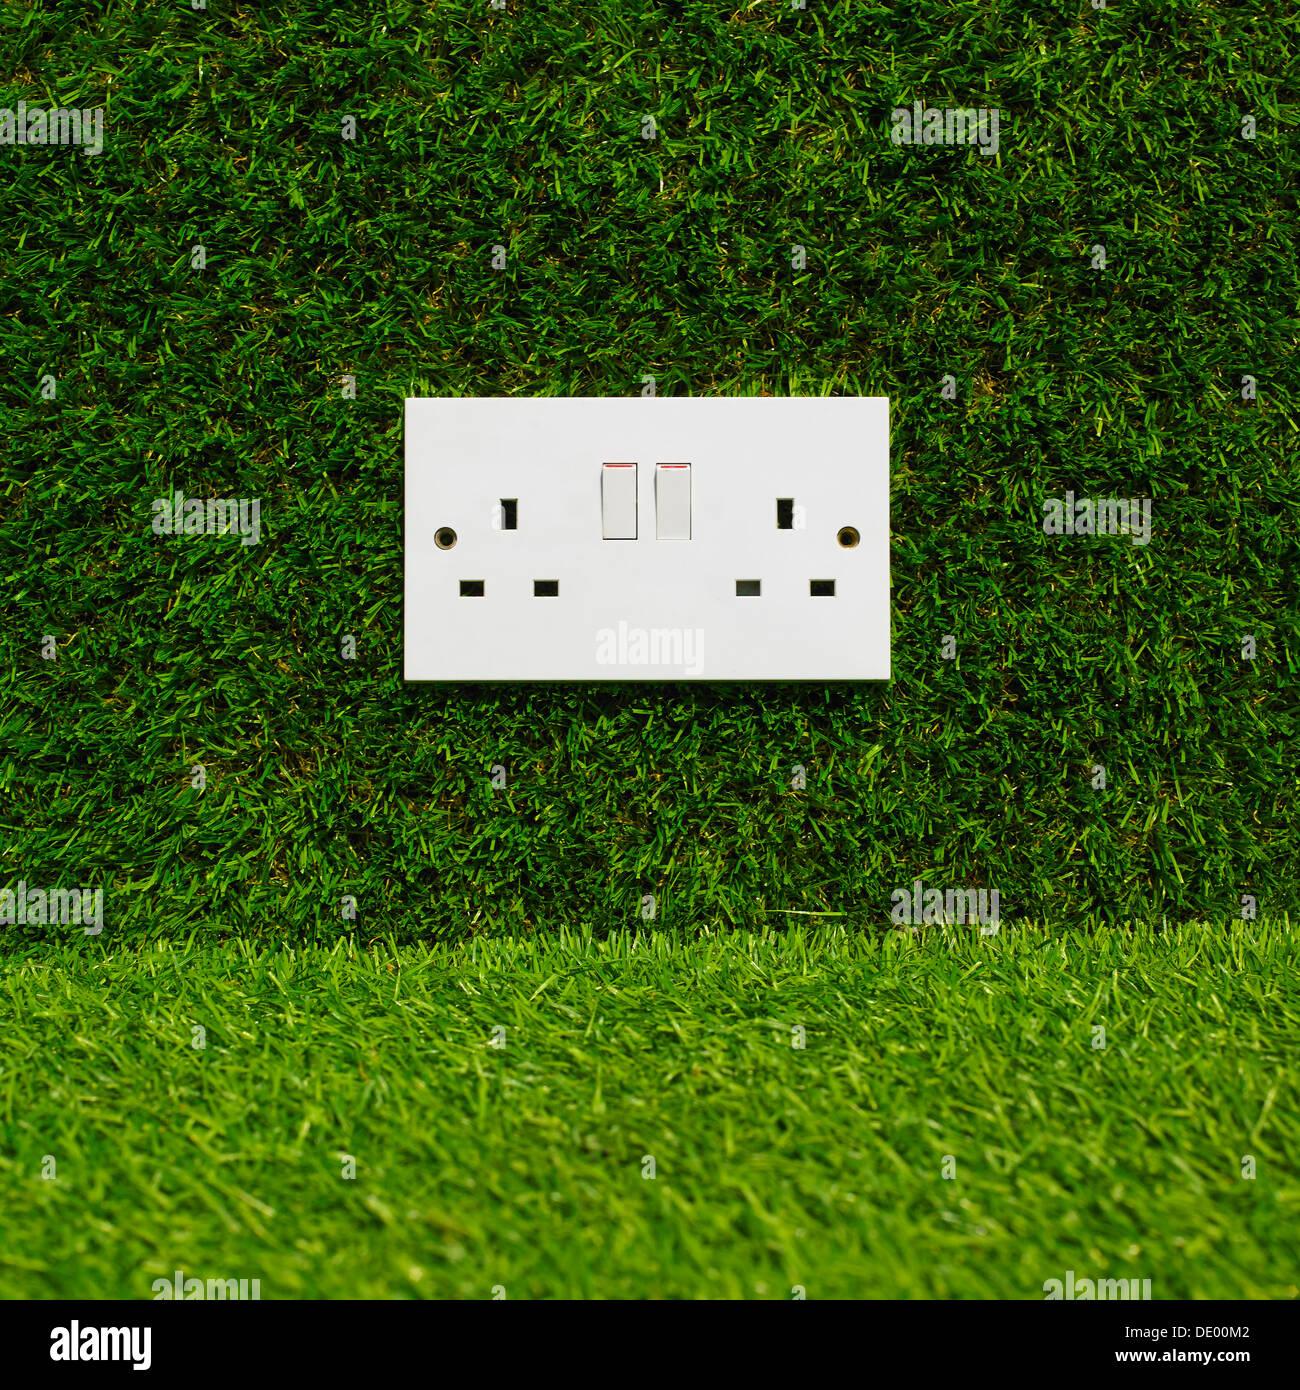 Electrical Plug Socket On Grass Background. - Stock Image